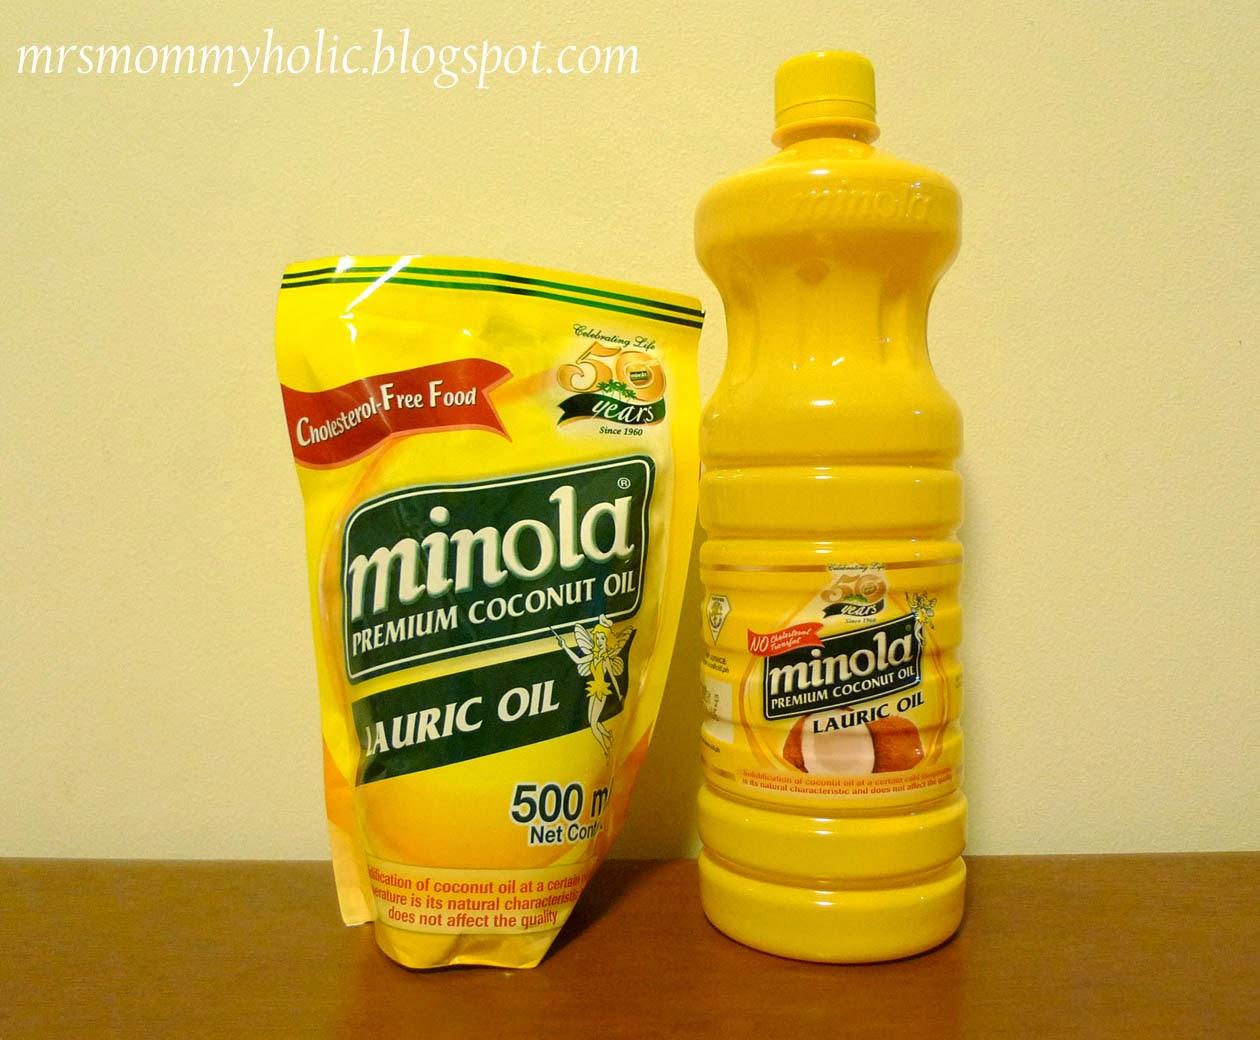 Mrsmommyholic The Many Health Benefits Of Minola Coconut Oil